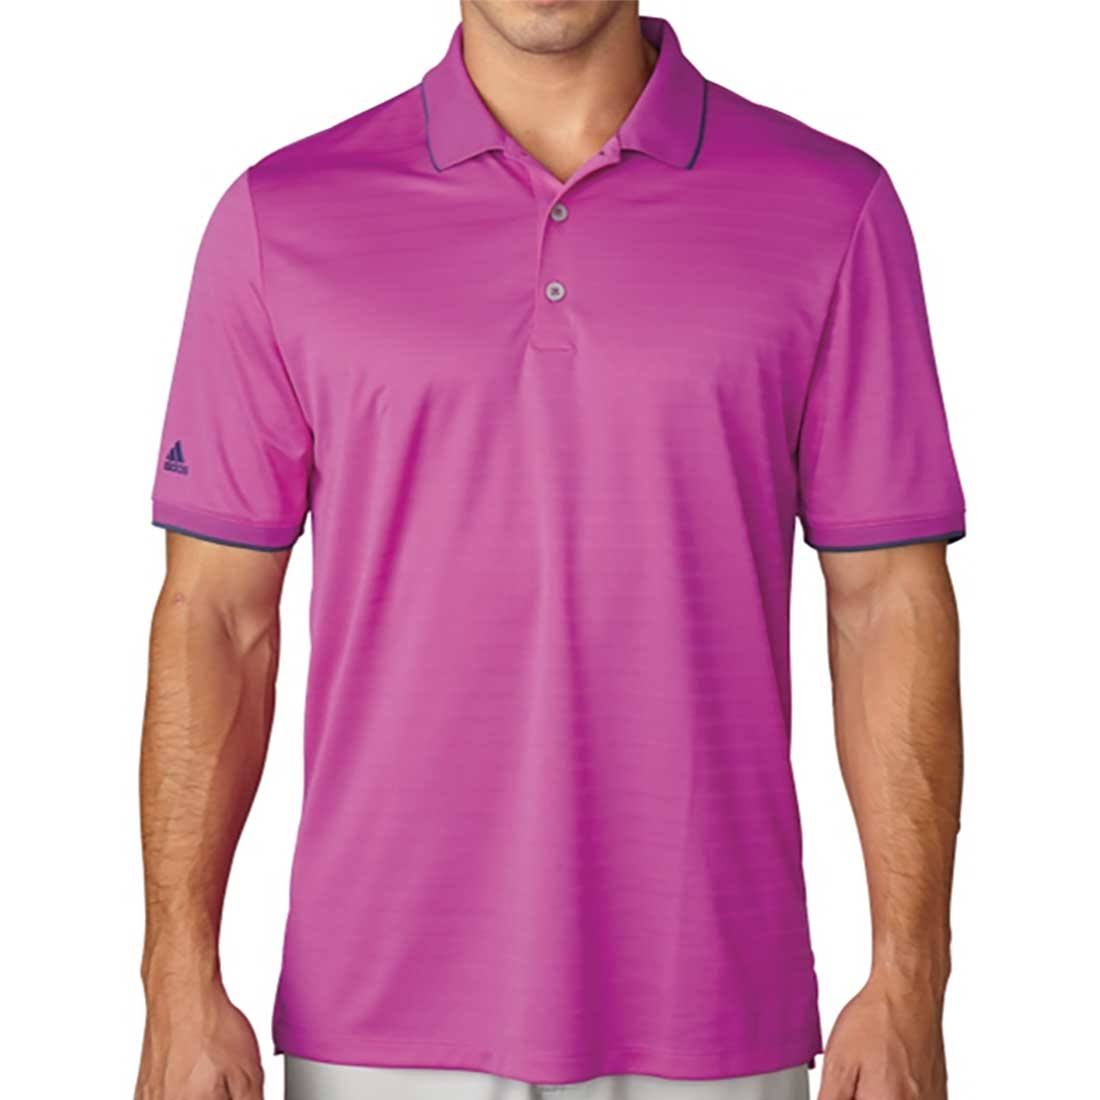 New 2016 Adidas Golf Climacool Tipped Club Polo Shirt Ebay